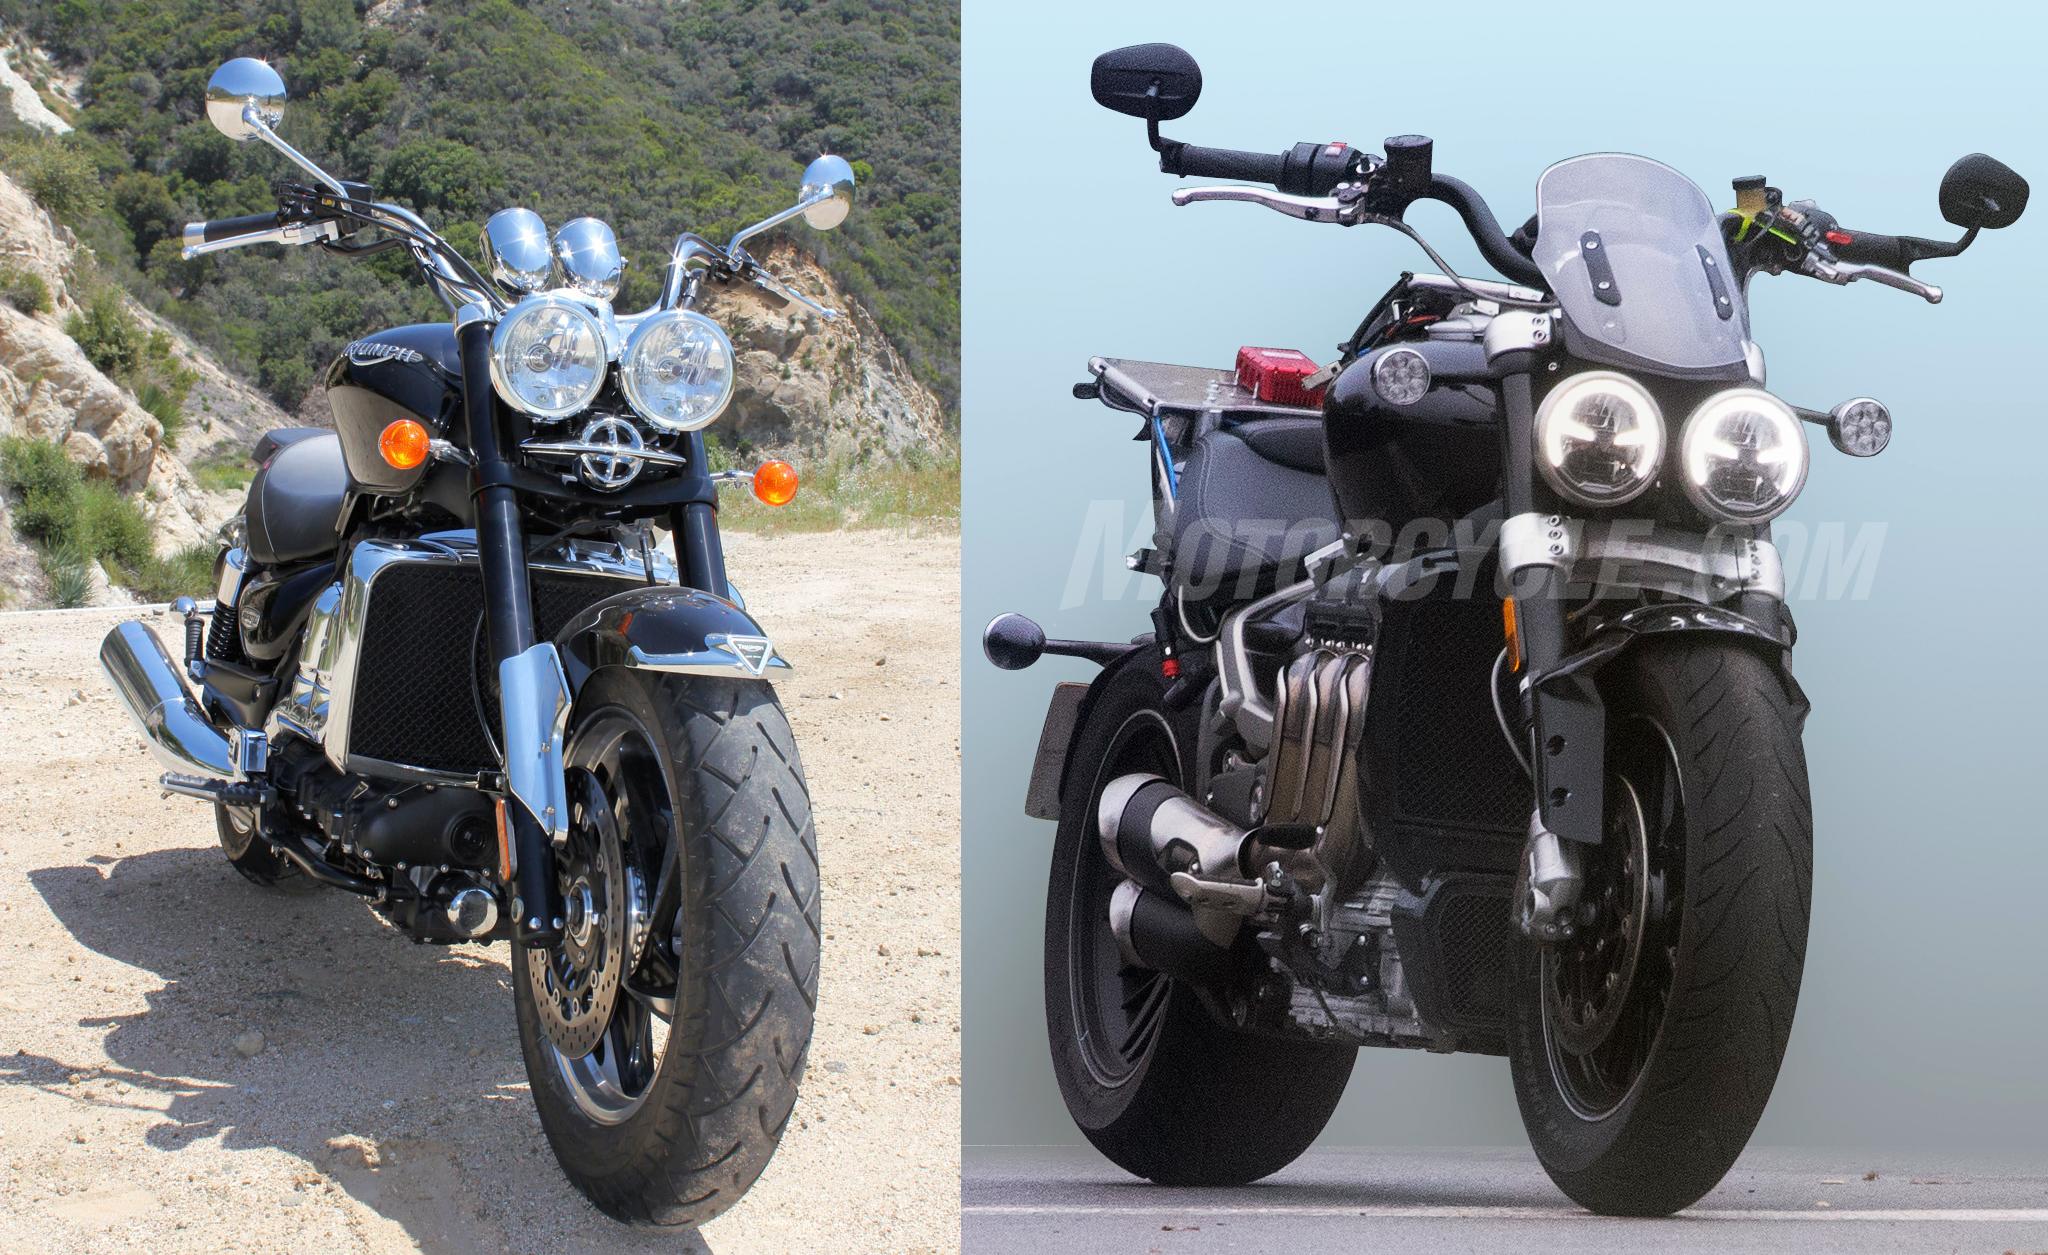 011019-2020-Triumph-Rocket-III-spy-photos-vs-2010-model